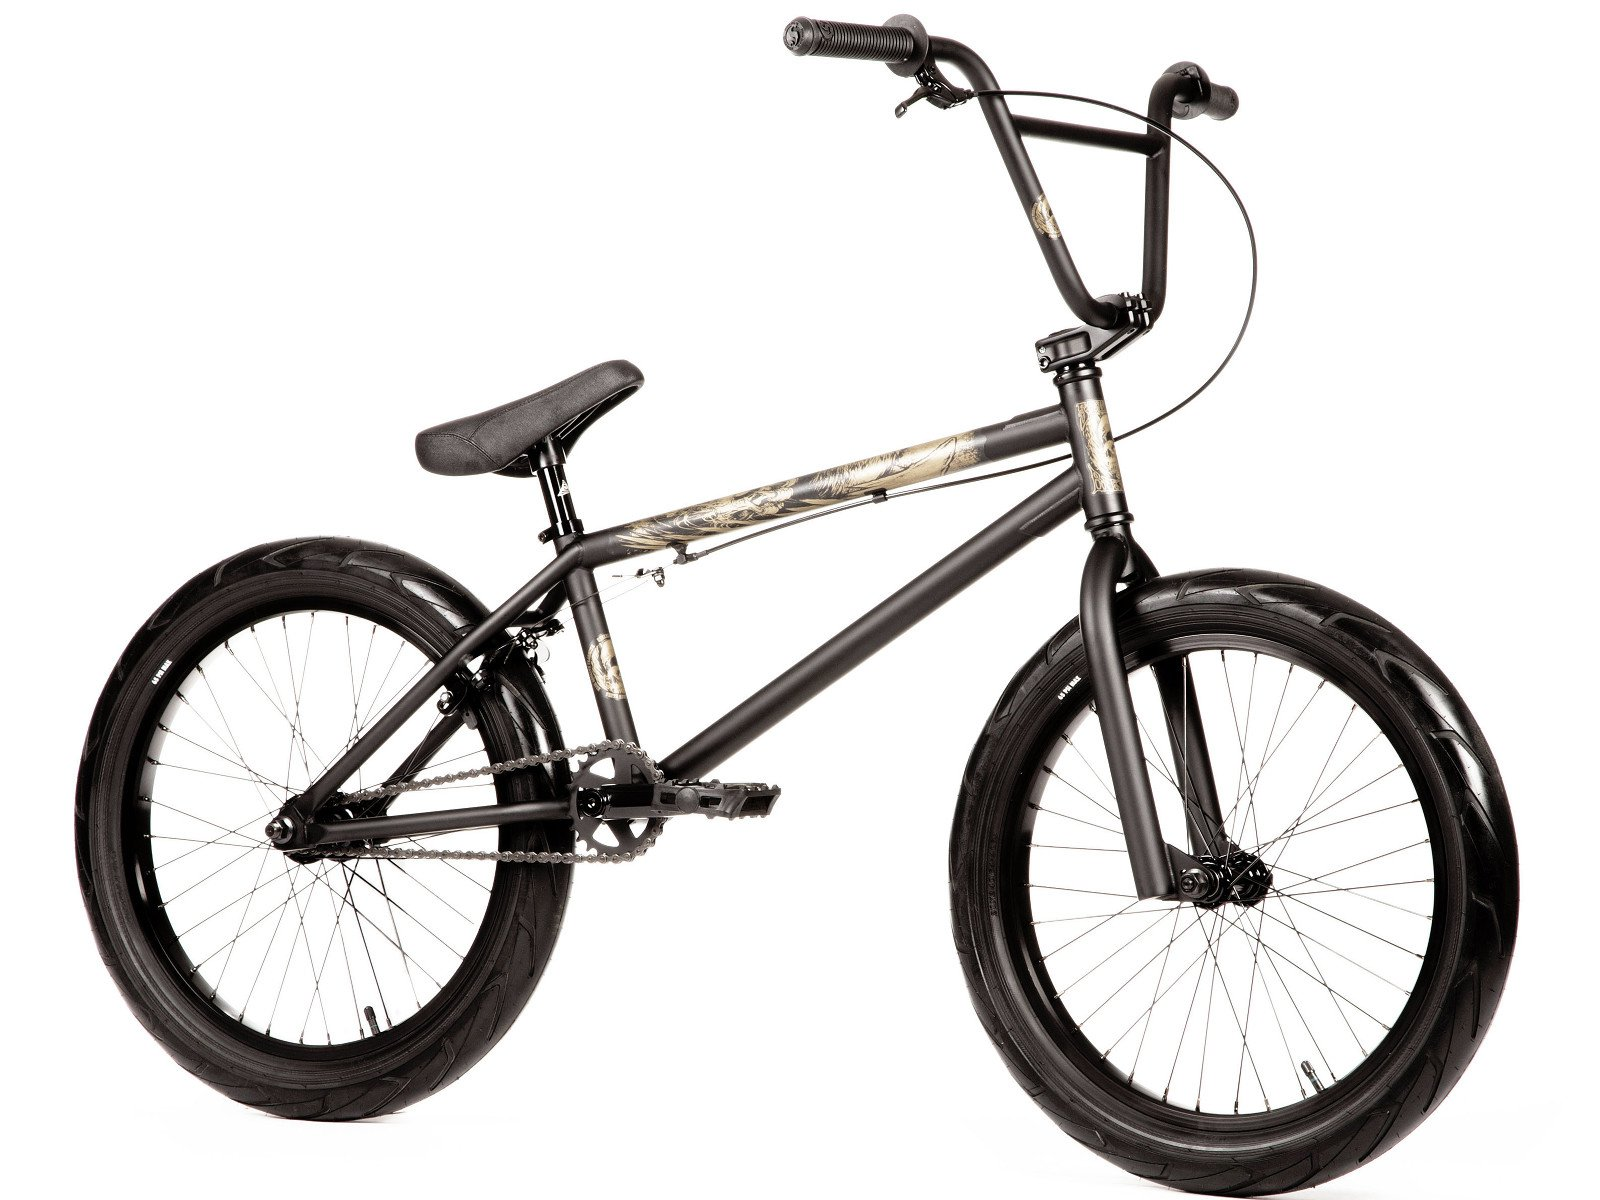 Stereo Bikes Amp 2018 Bmx Bike Sooty Matt Black Kunstform